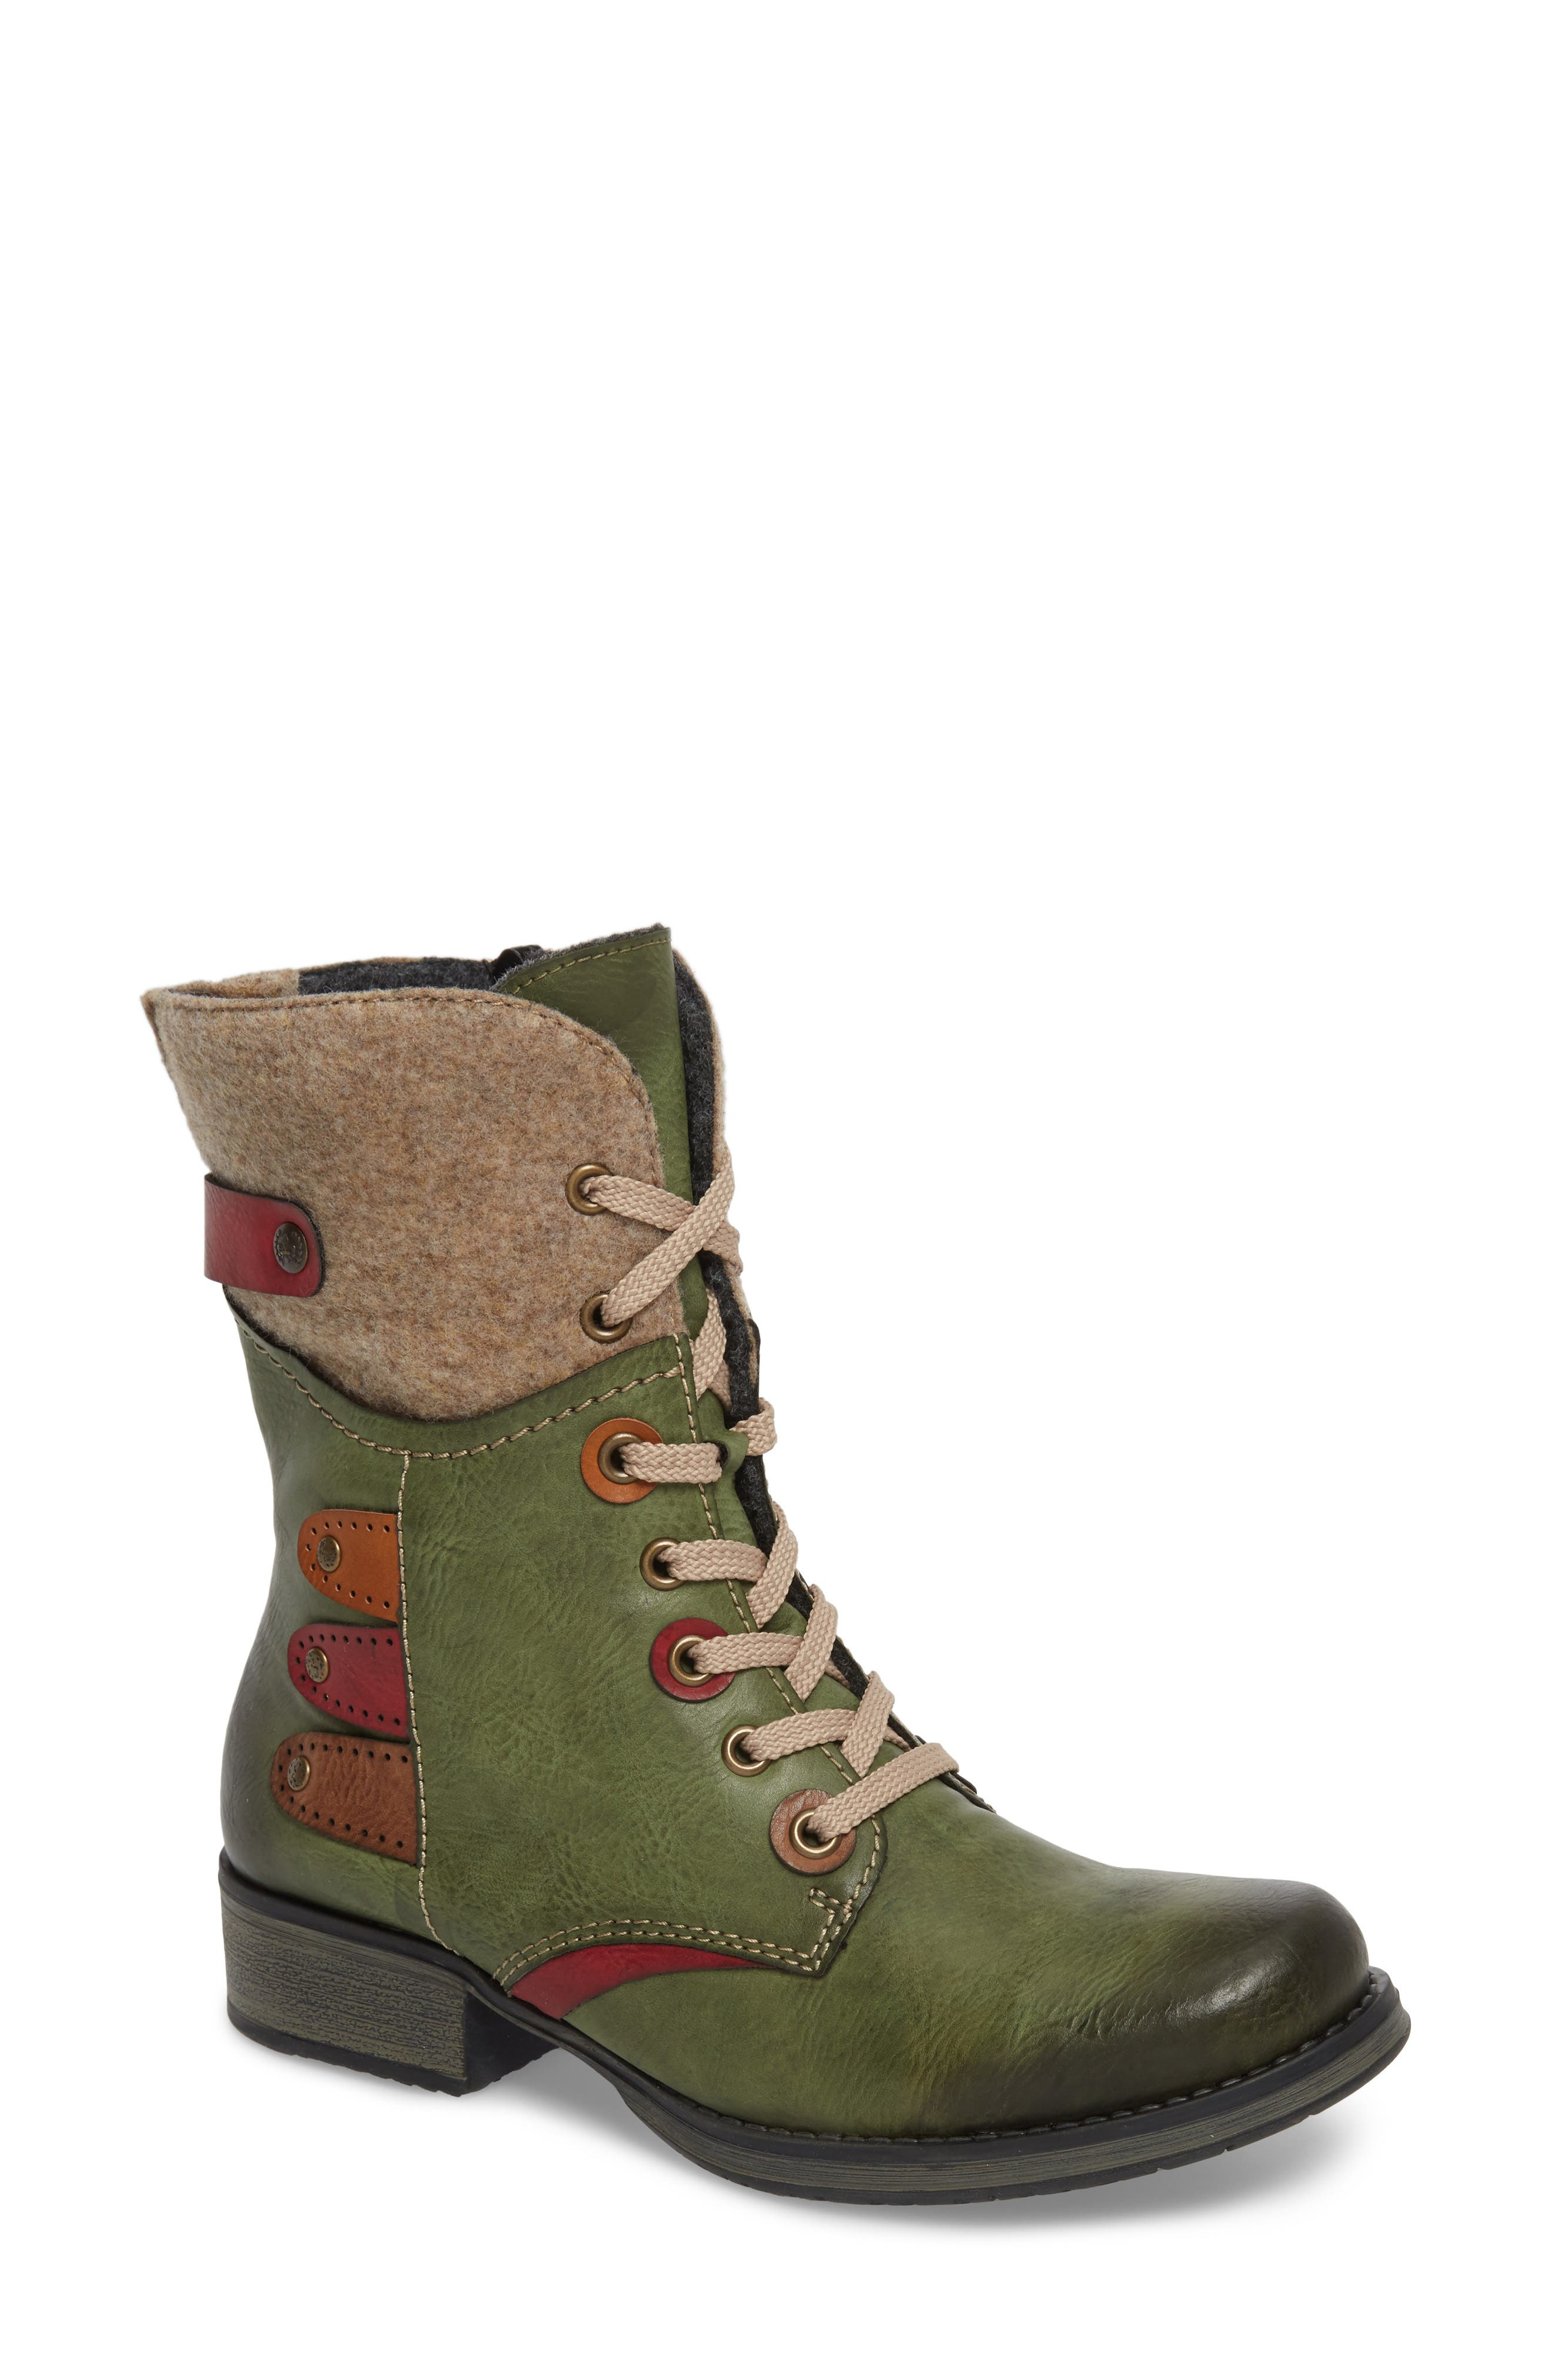 Rieker Antistress Fergie 43 Lace-Up Boot (Women)